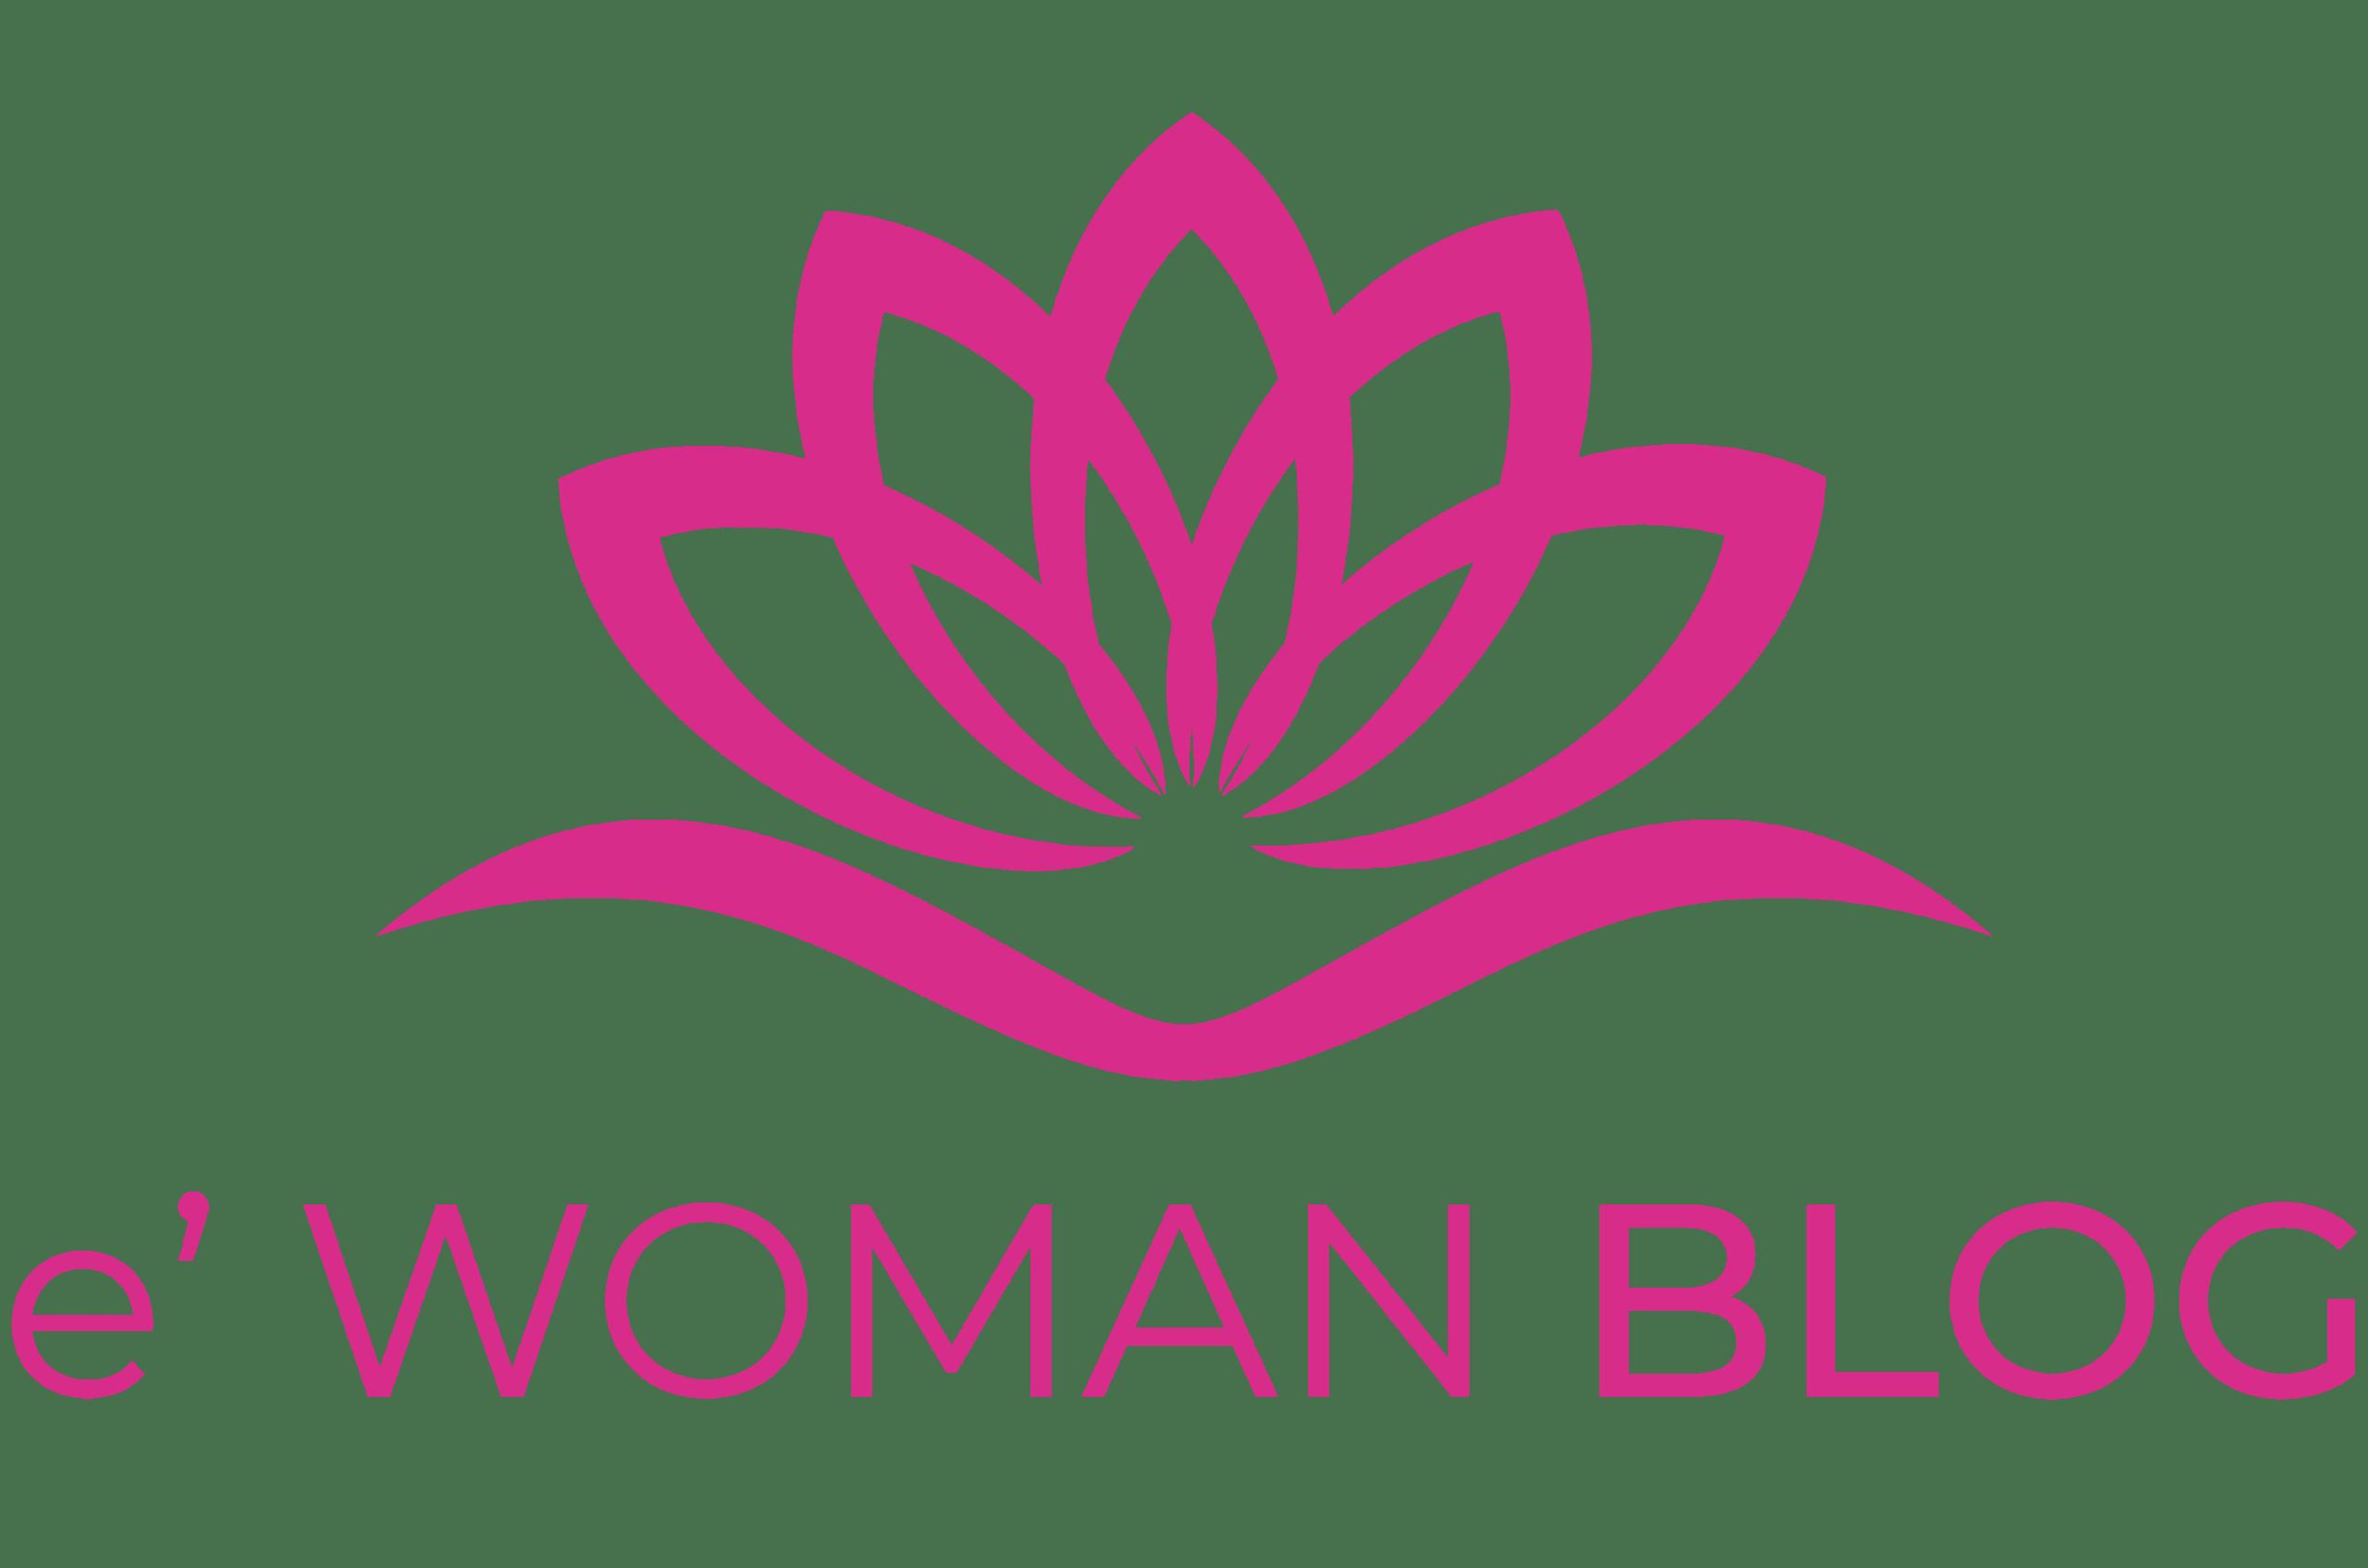 ewomanblog.fr